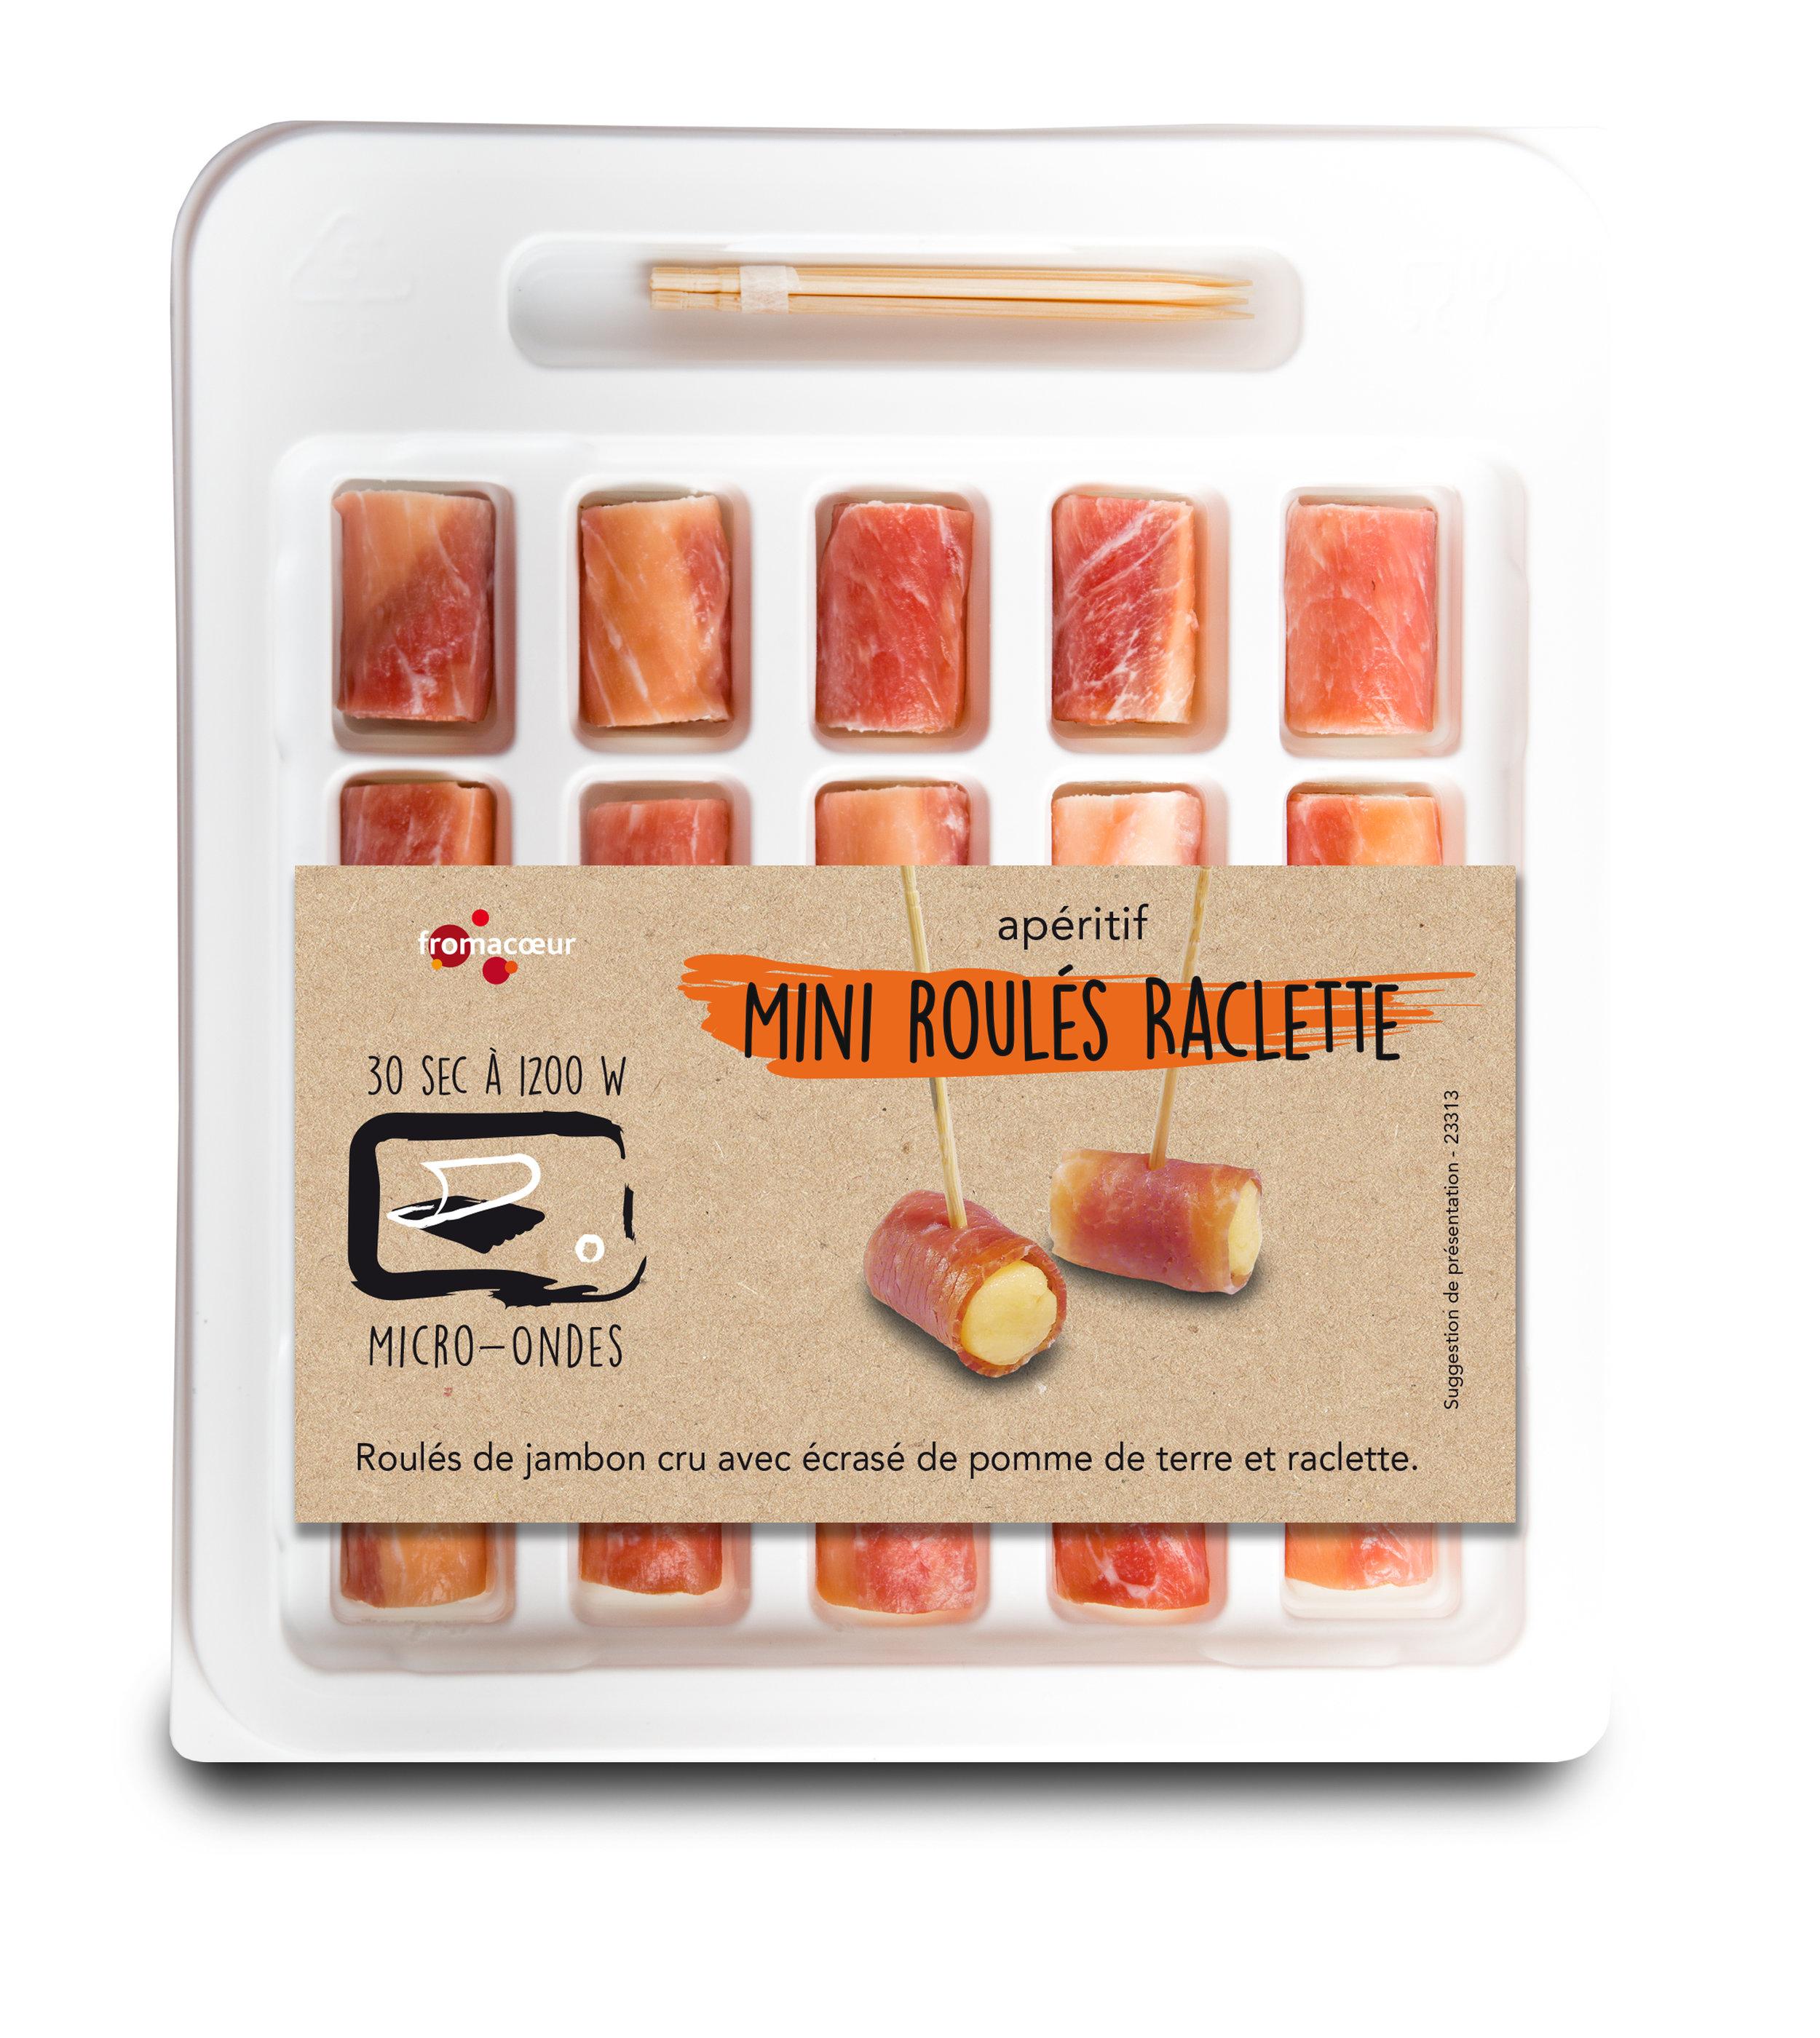 Mini raclette roulades